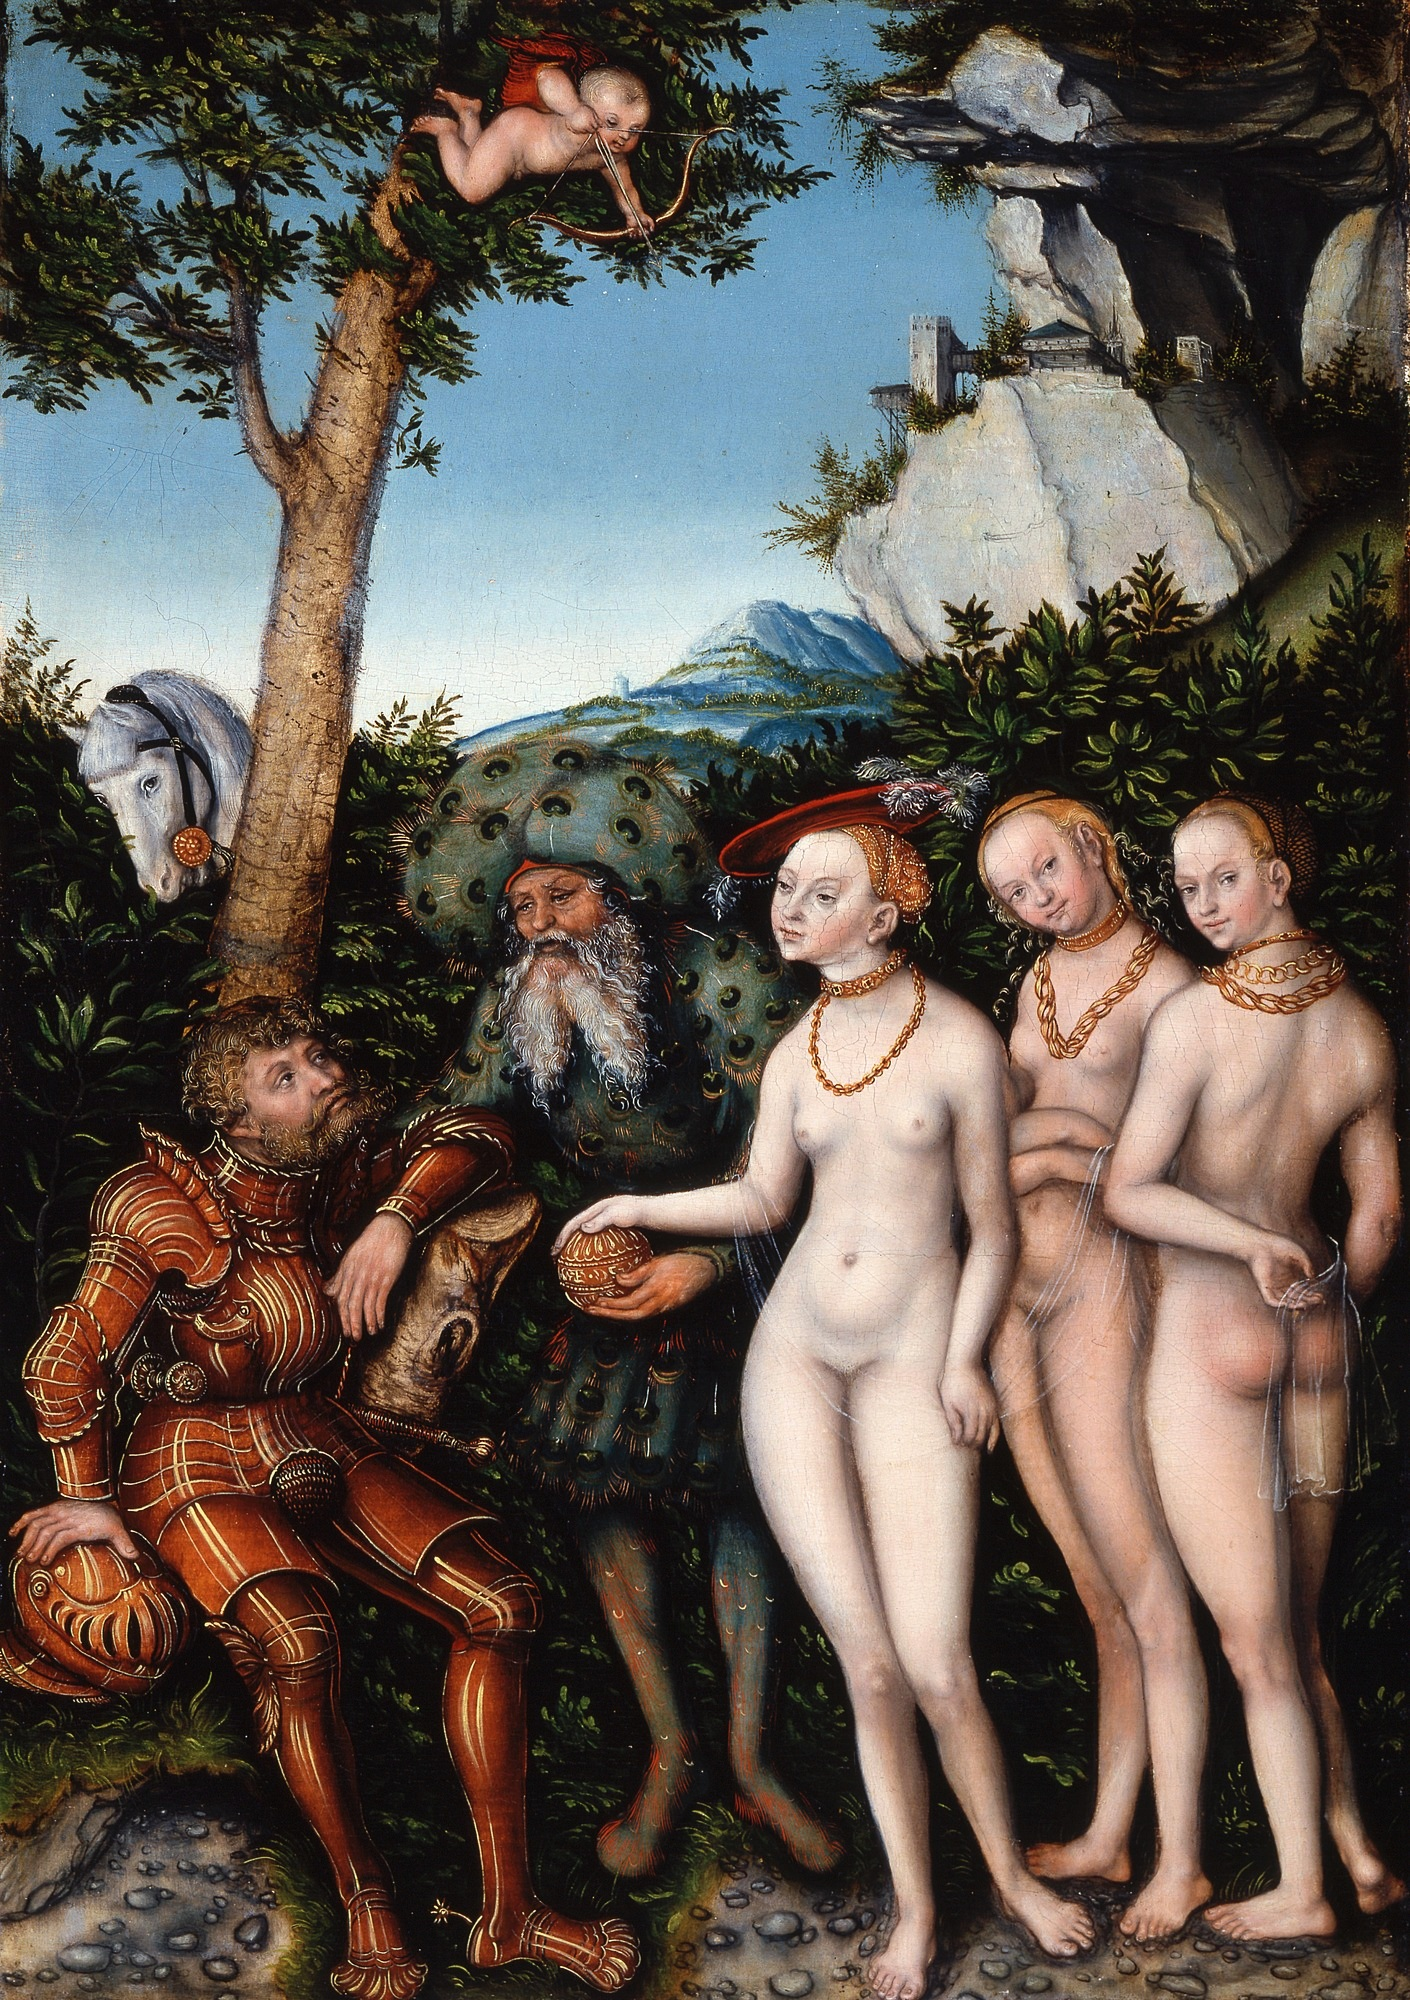 http://upload.wikimedia.org/wikipedia/commons/2/2d/Lucas_Cranach_the_Elder_-_Judgment_of_Paris.jpg